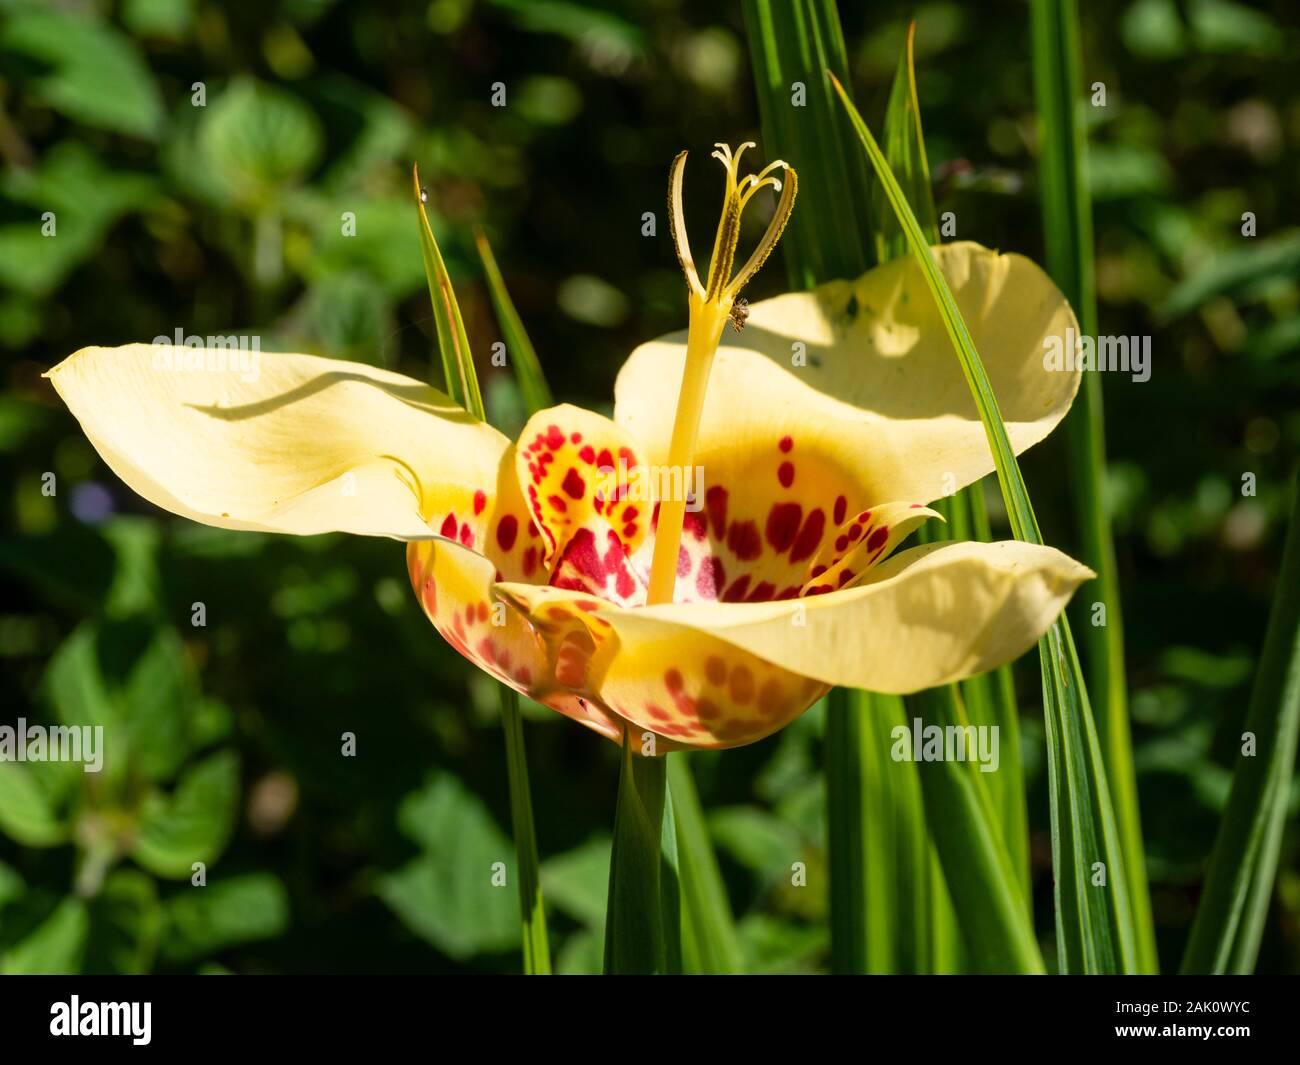 5 Tigridia Pavonia Tiger Flower Samen Blumen Samen Mexico Samen